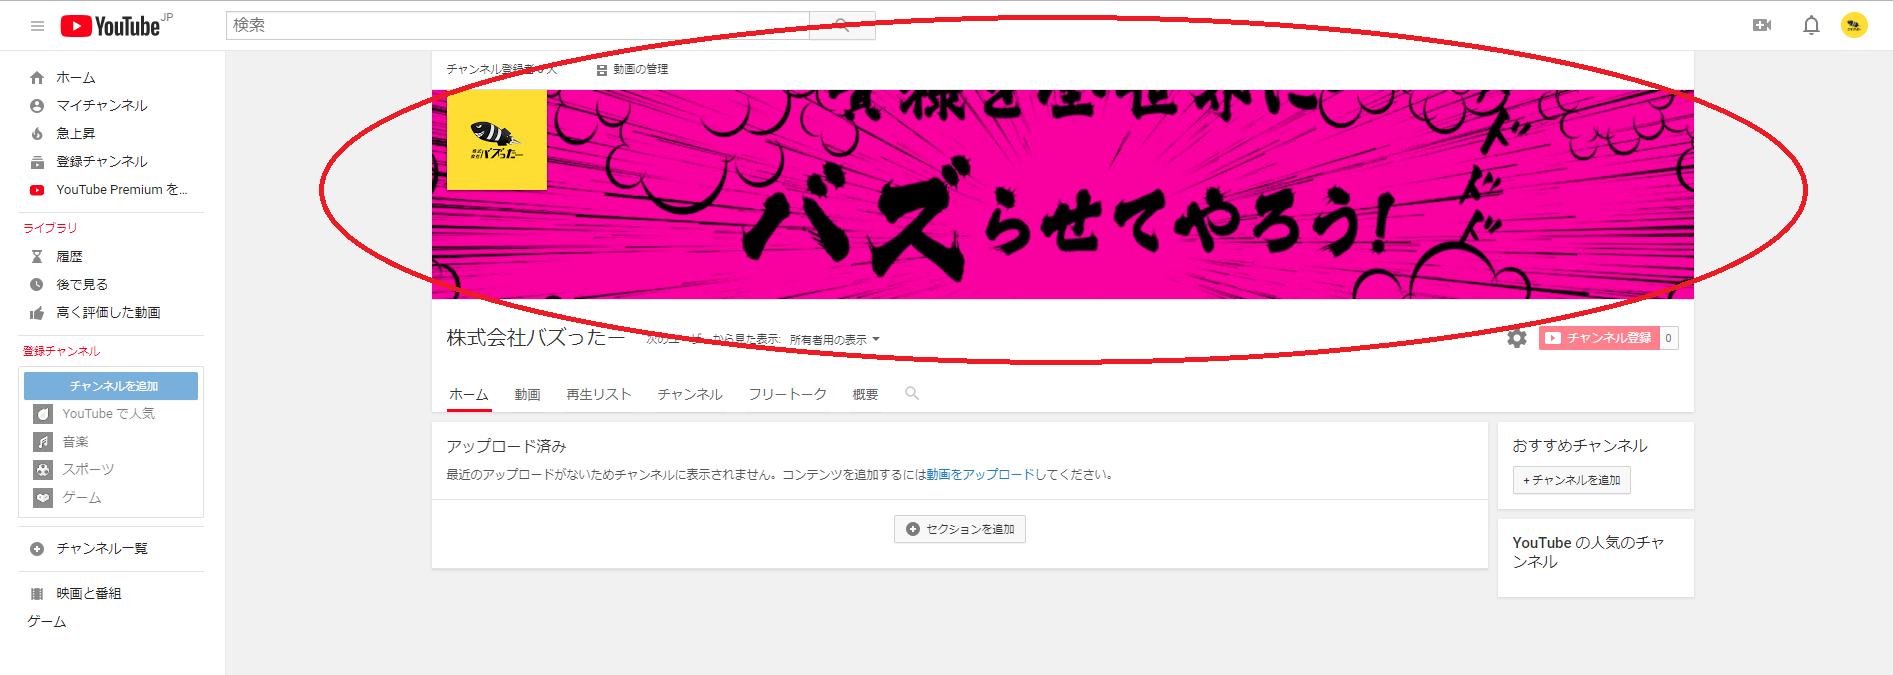 YouTube ブランドアカウント 作成-10